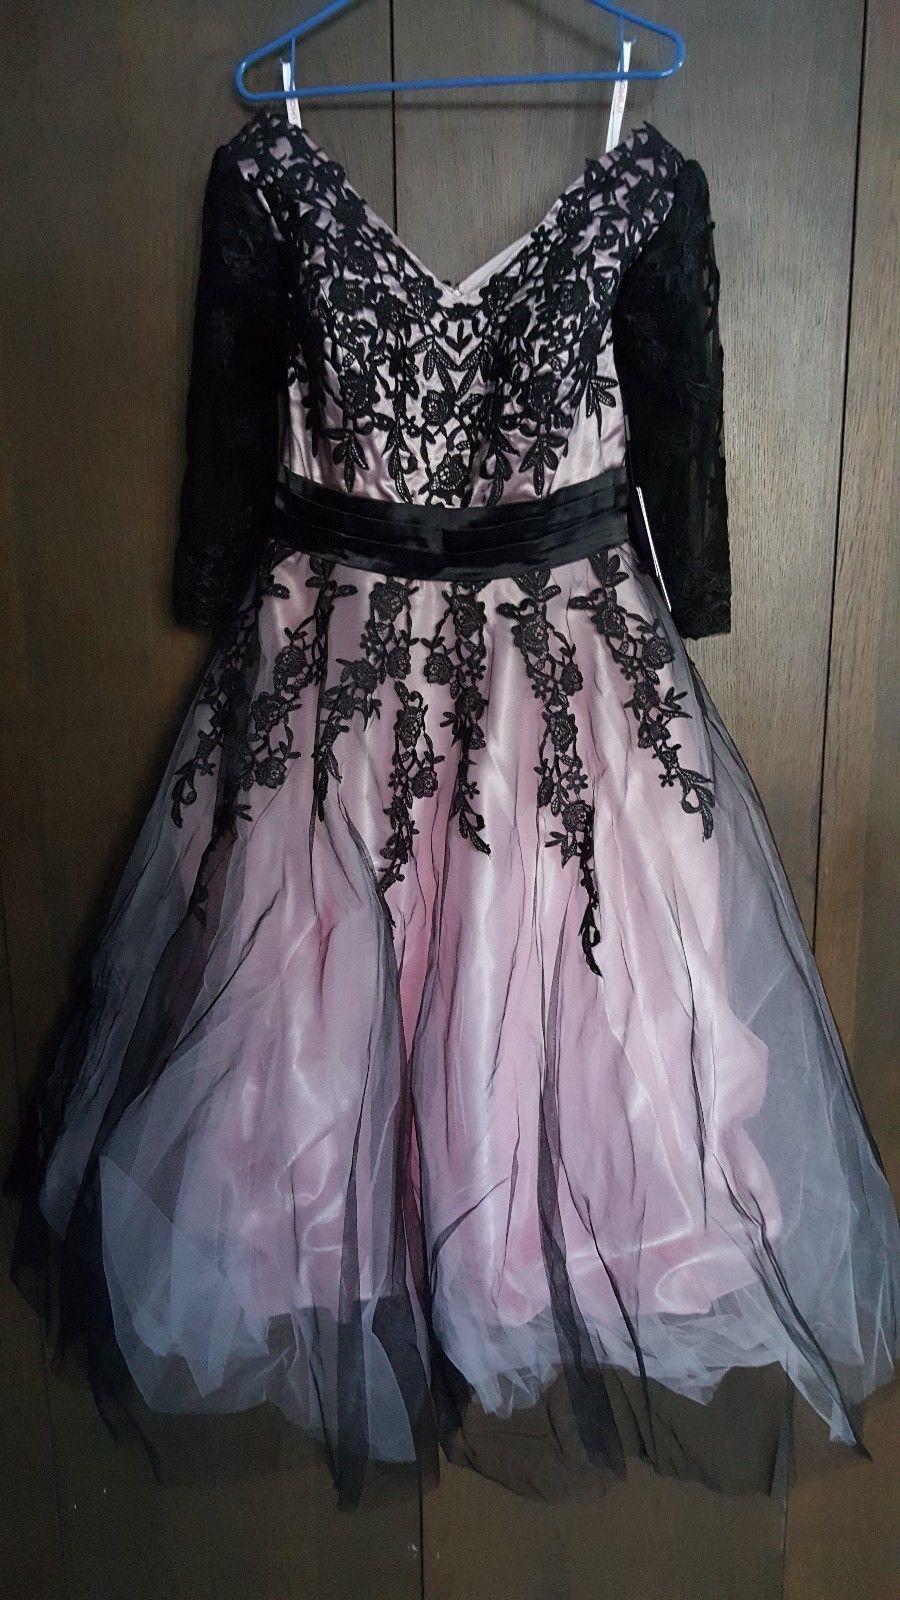 Pink cocktail dress for wedding  JJs House Party Dress Cocktail Dress Wedding Guest PinkBlack